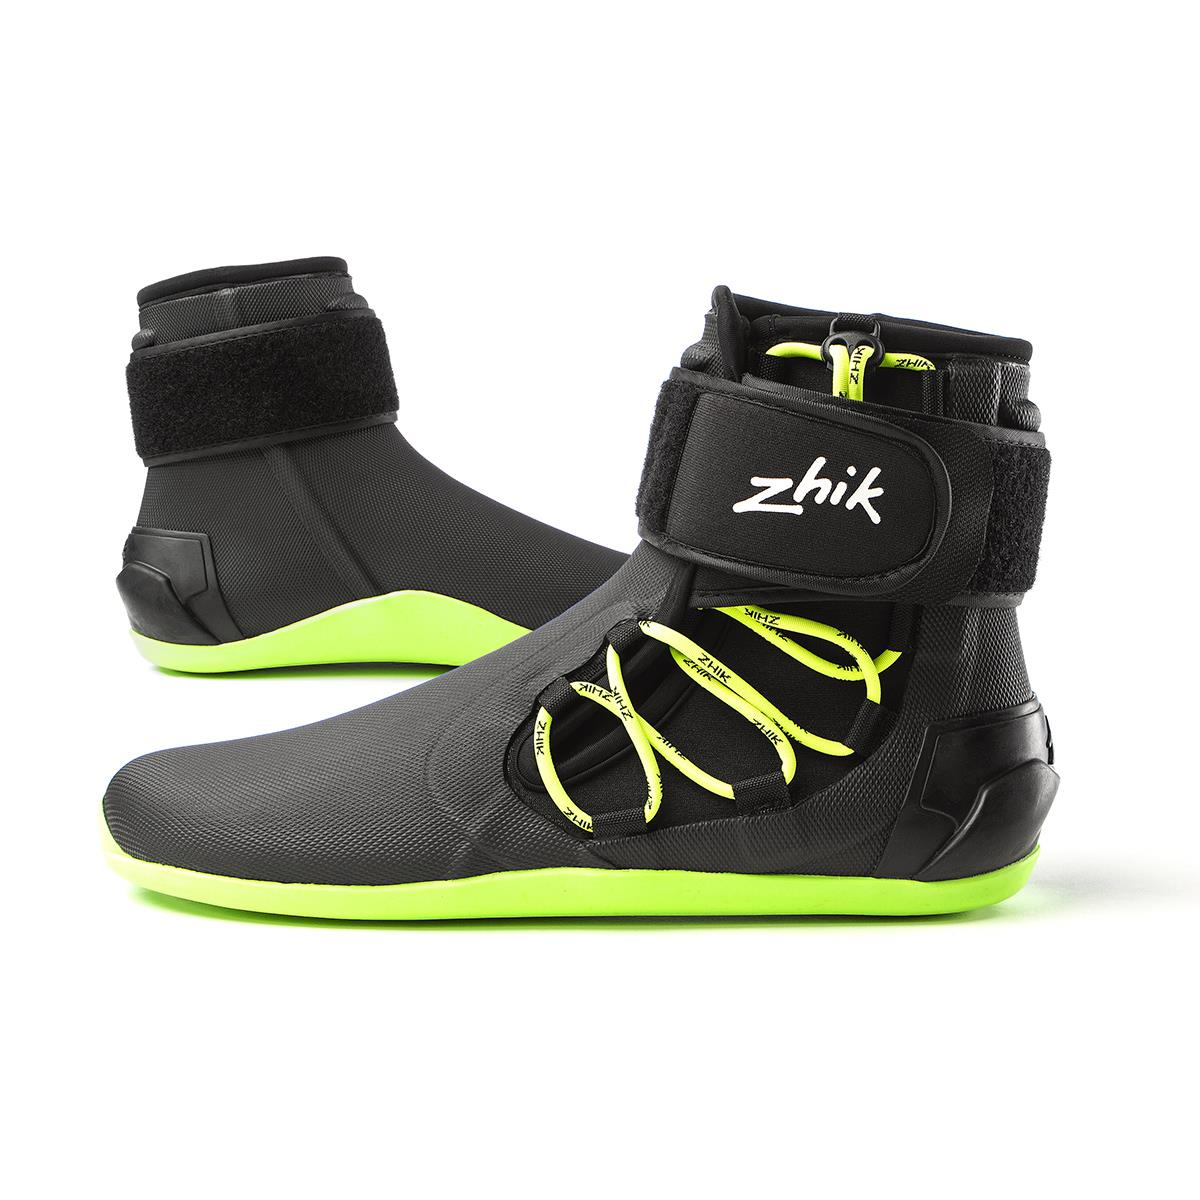 Zhik 470 sailing boots